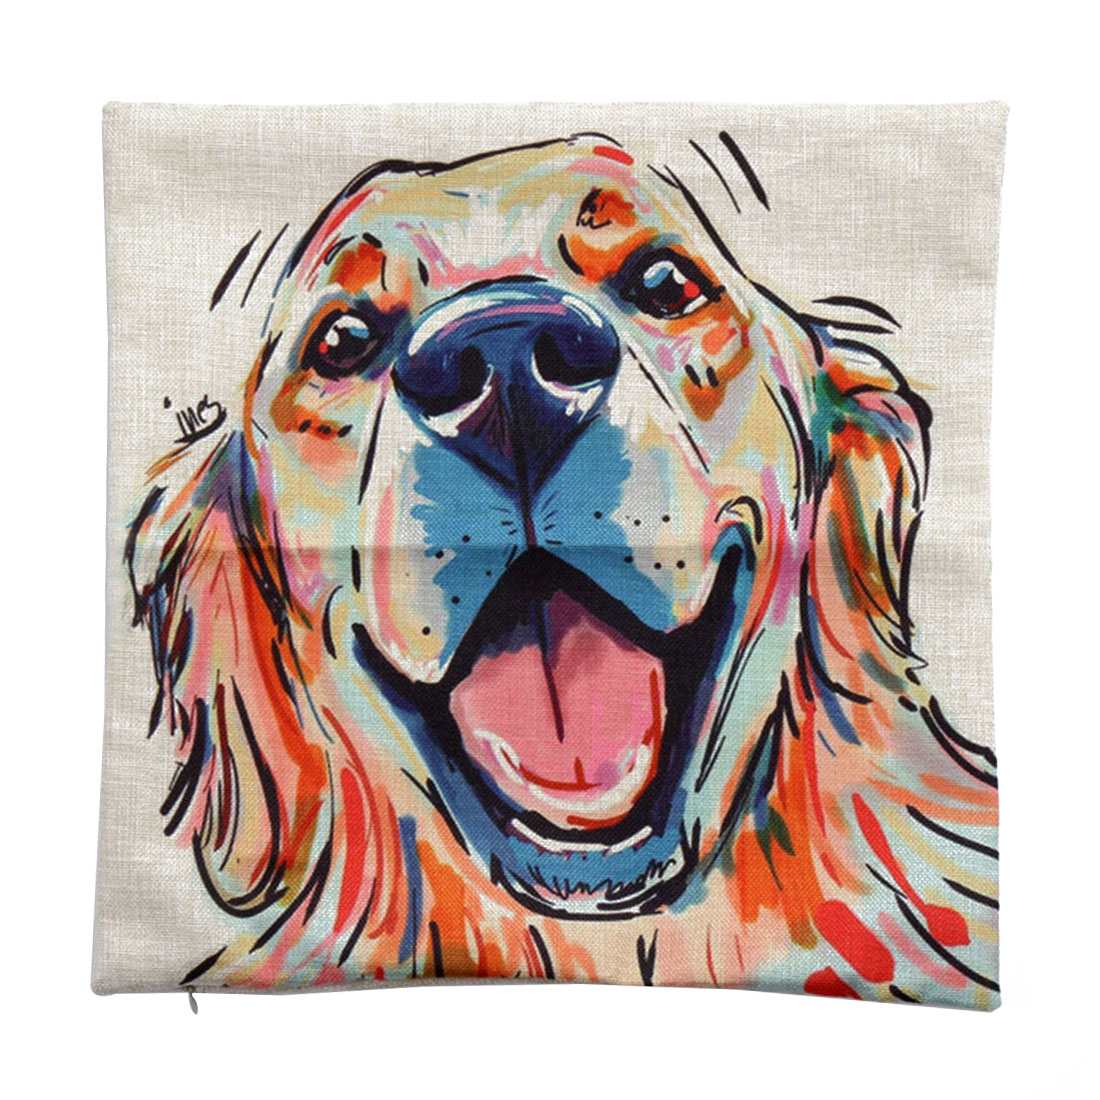 Piccocasa Linen Painting Dog Face Pattern Pillowcase Cushion Cover 45 x 45cm